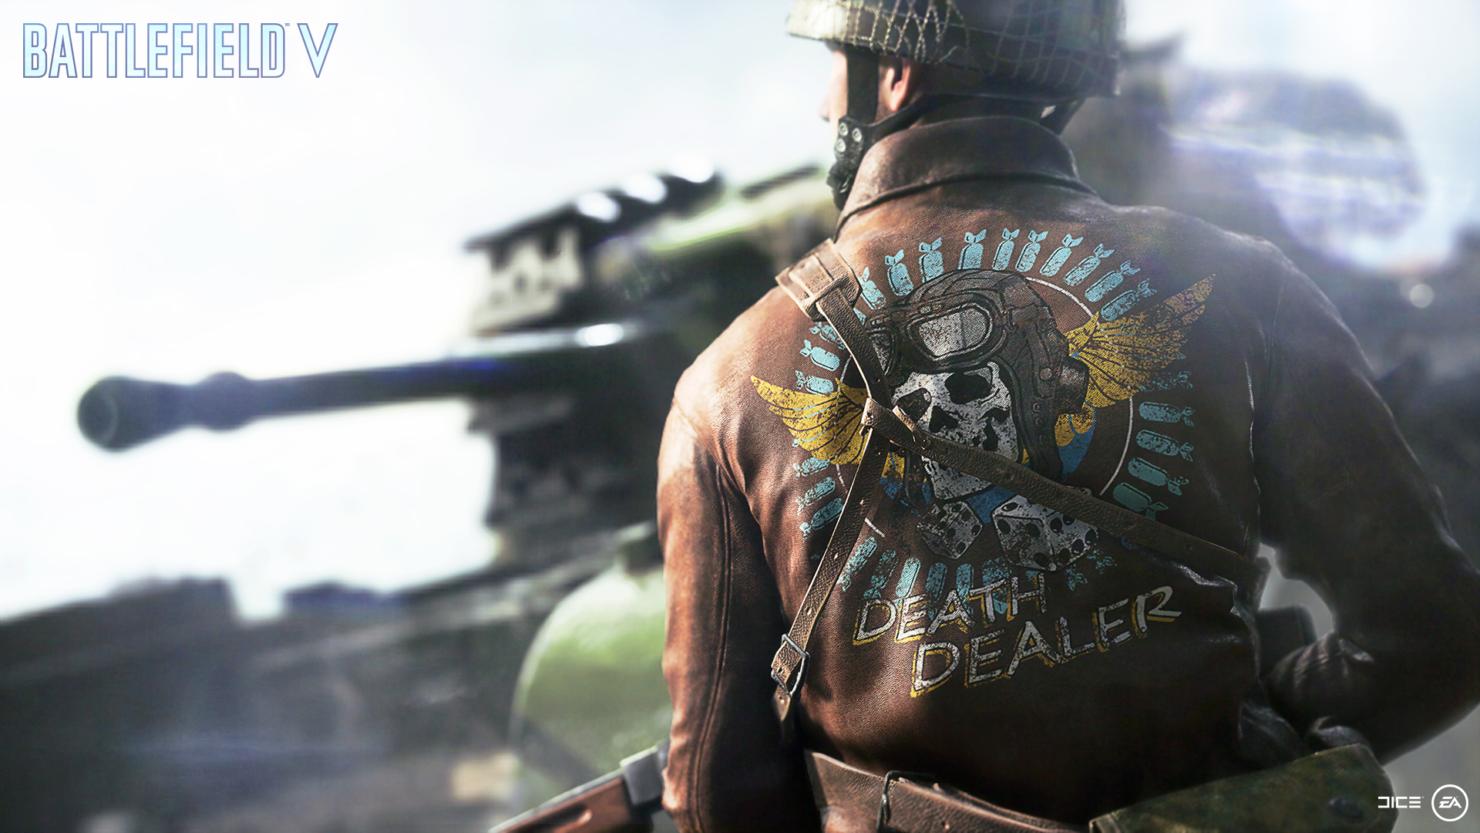 battlefield-v-reveal-screenshot-009